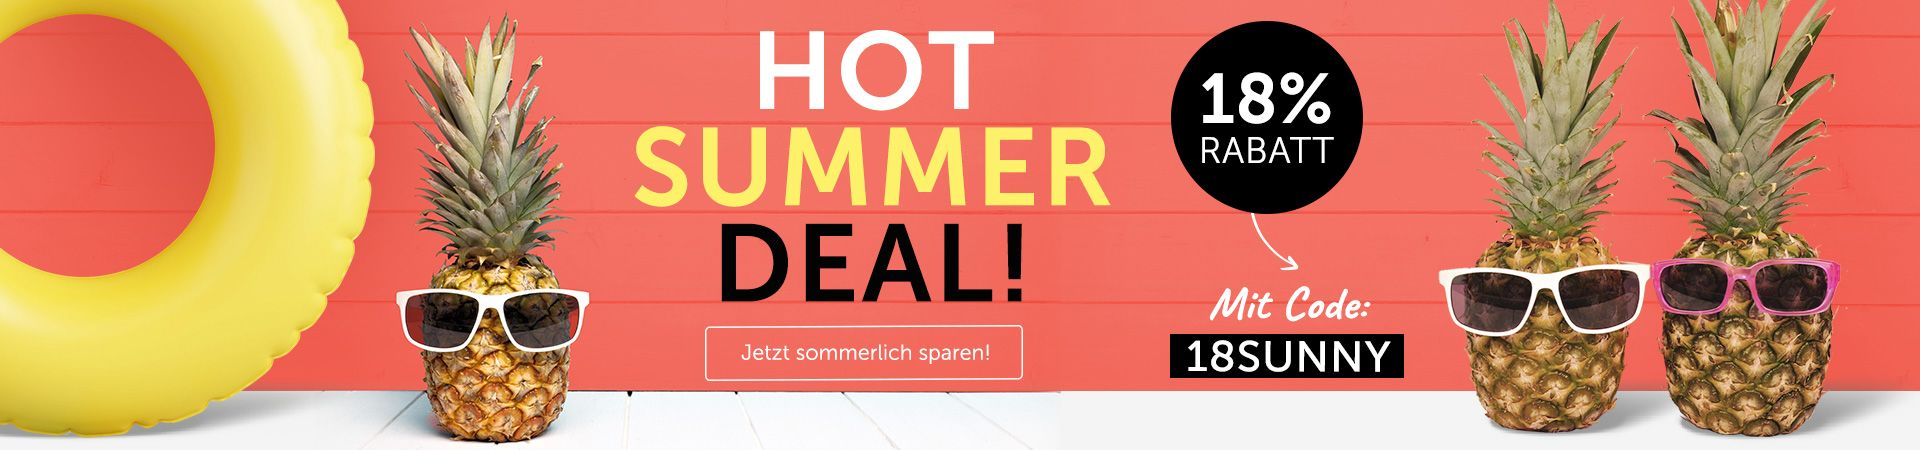 Hol dir jetzt 18% Rabatt auf Alles im Hot Summer Deal!